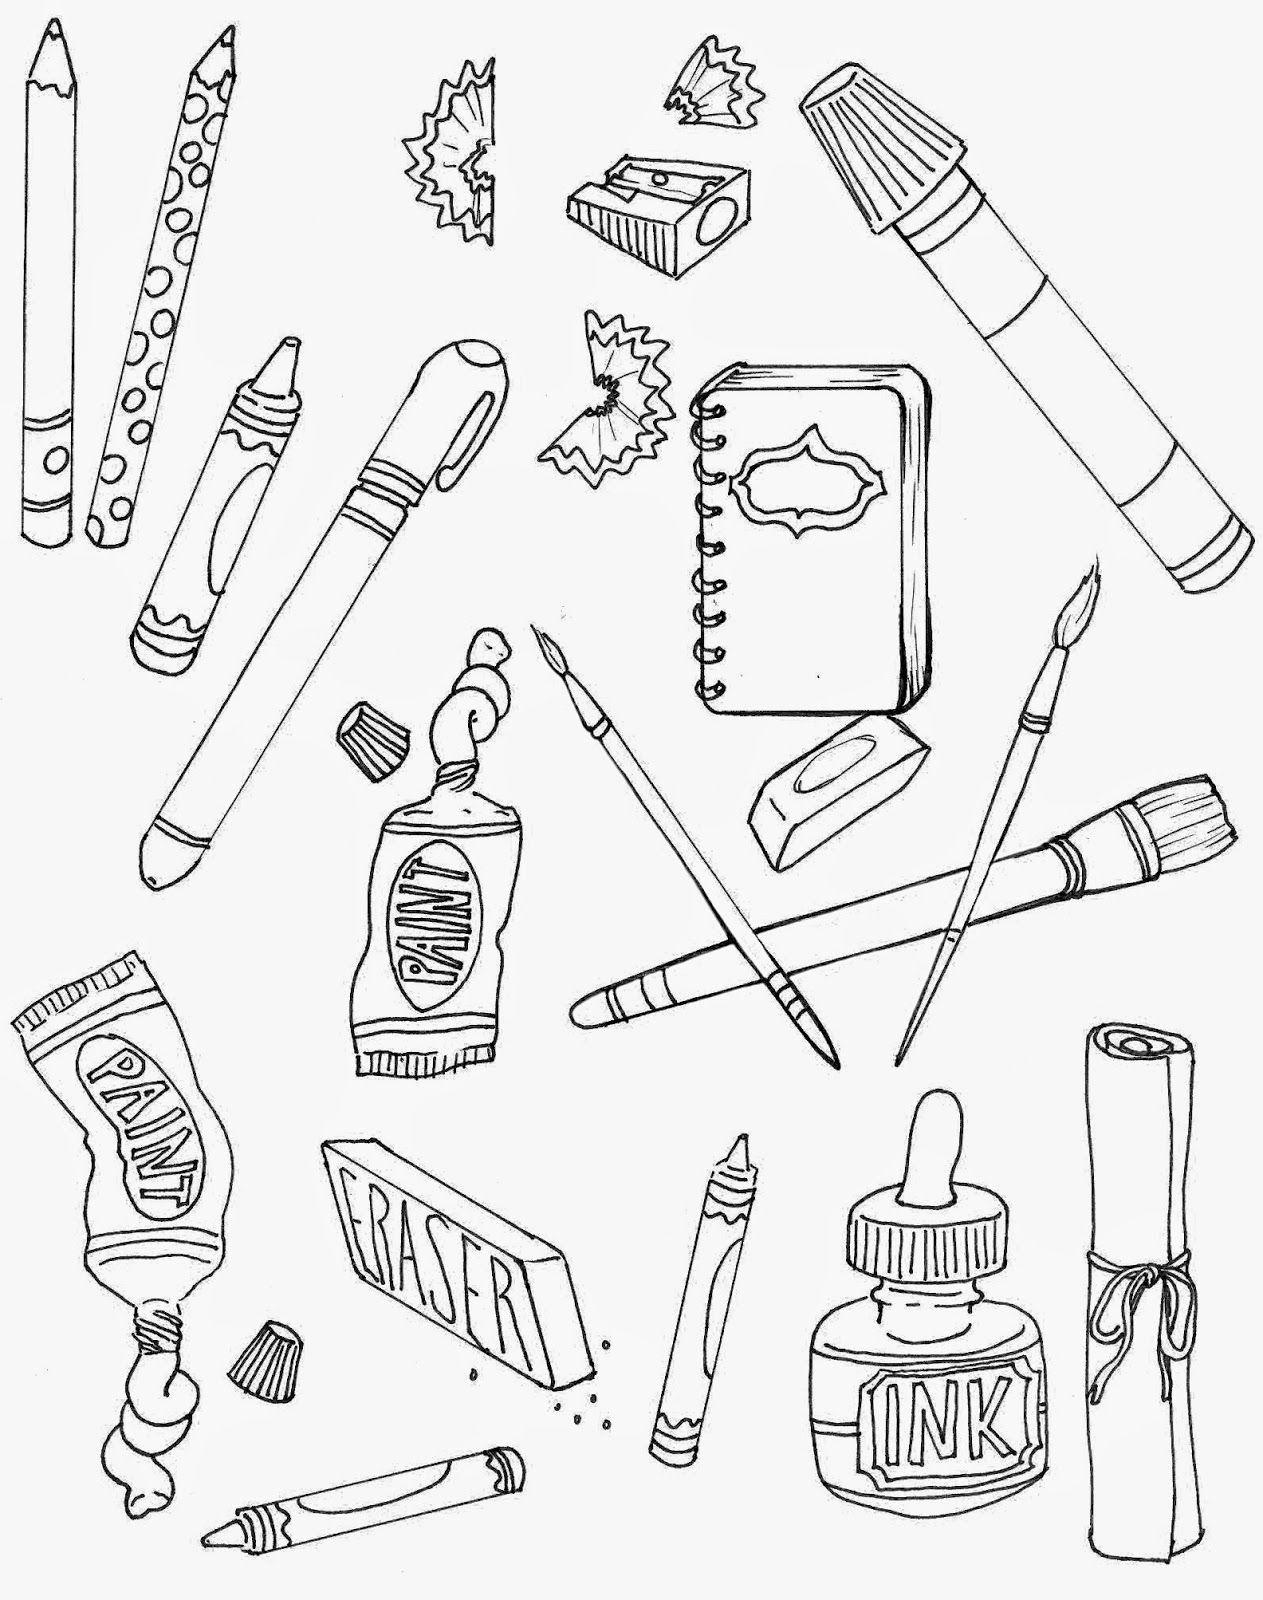 Sunday Fun Art Supplies Coloring Page Art Supplies Drawing Art